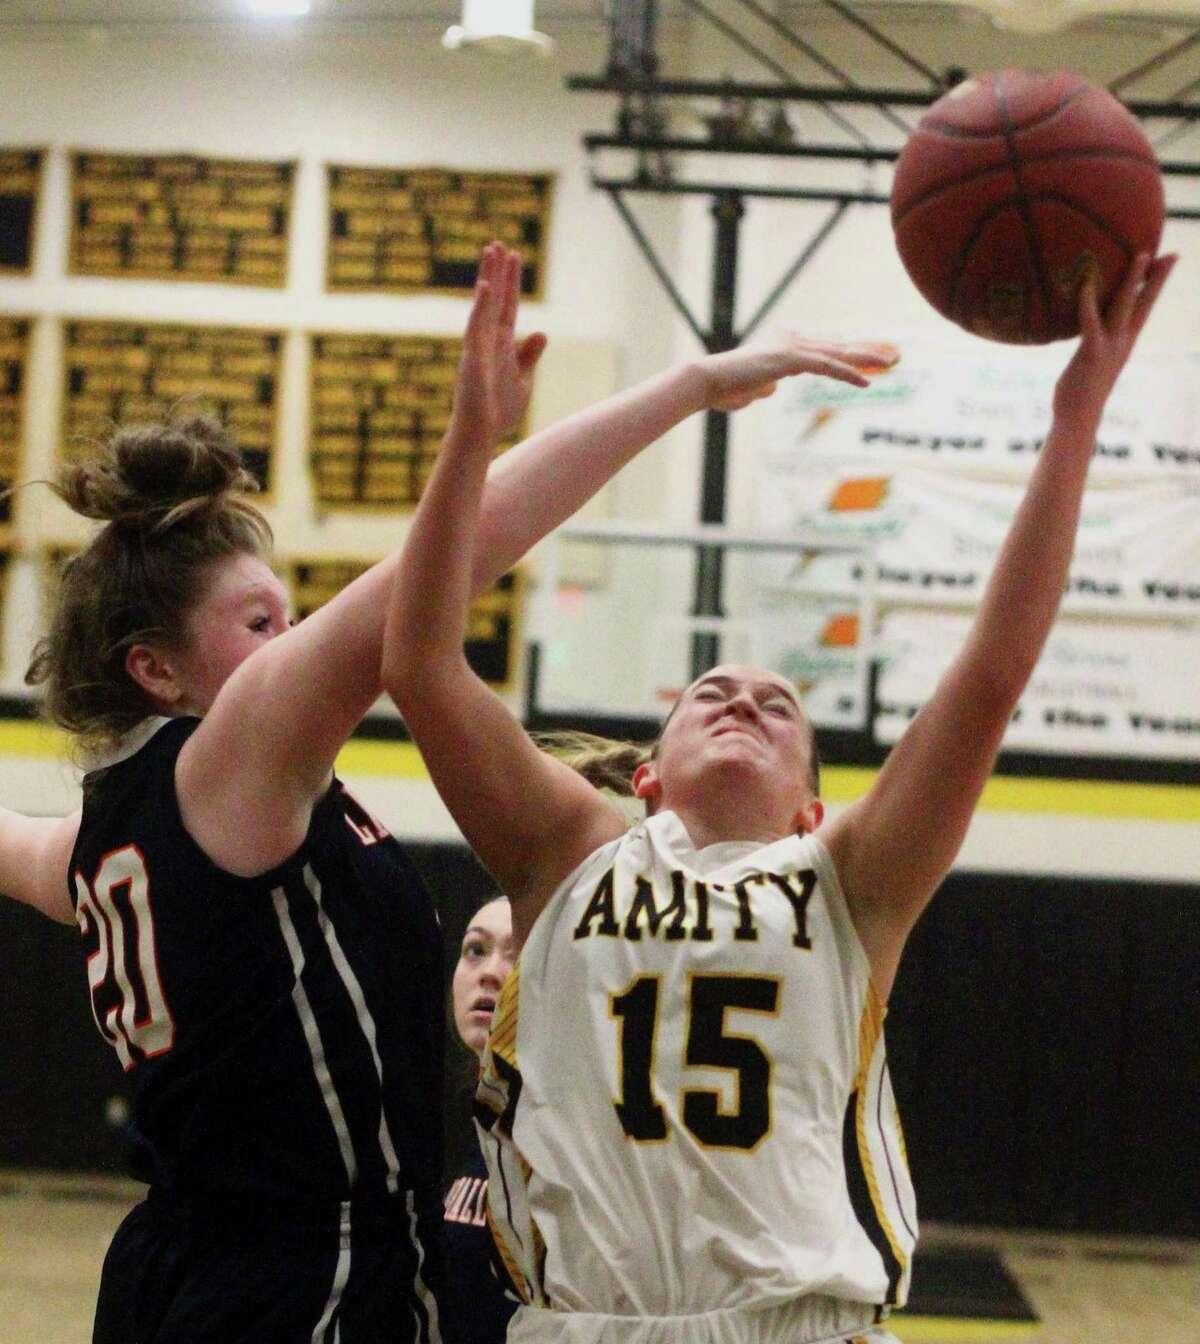 Amity's Jillian Martin (15) looks to score as Lyman Hall's Theresa Lynch (20) blocks during basketball action in Woodbridge, Conn., on Thursday Dec. 13, 2018.